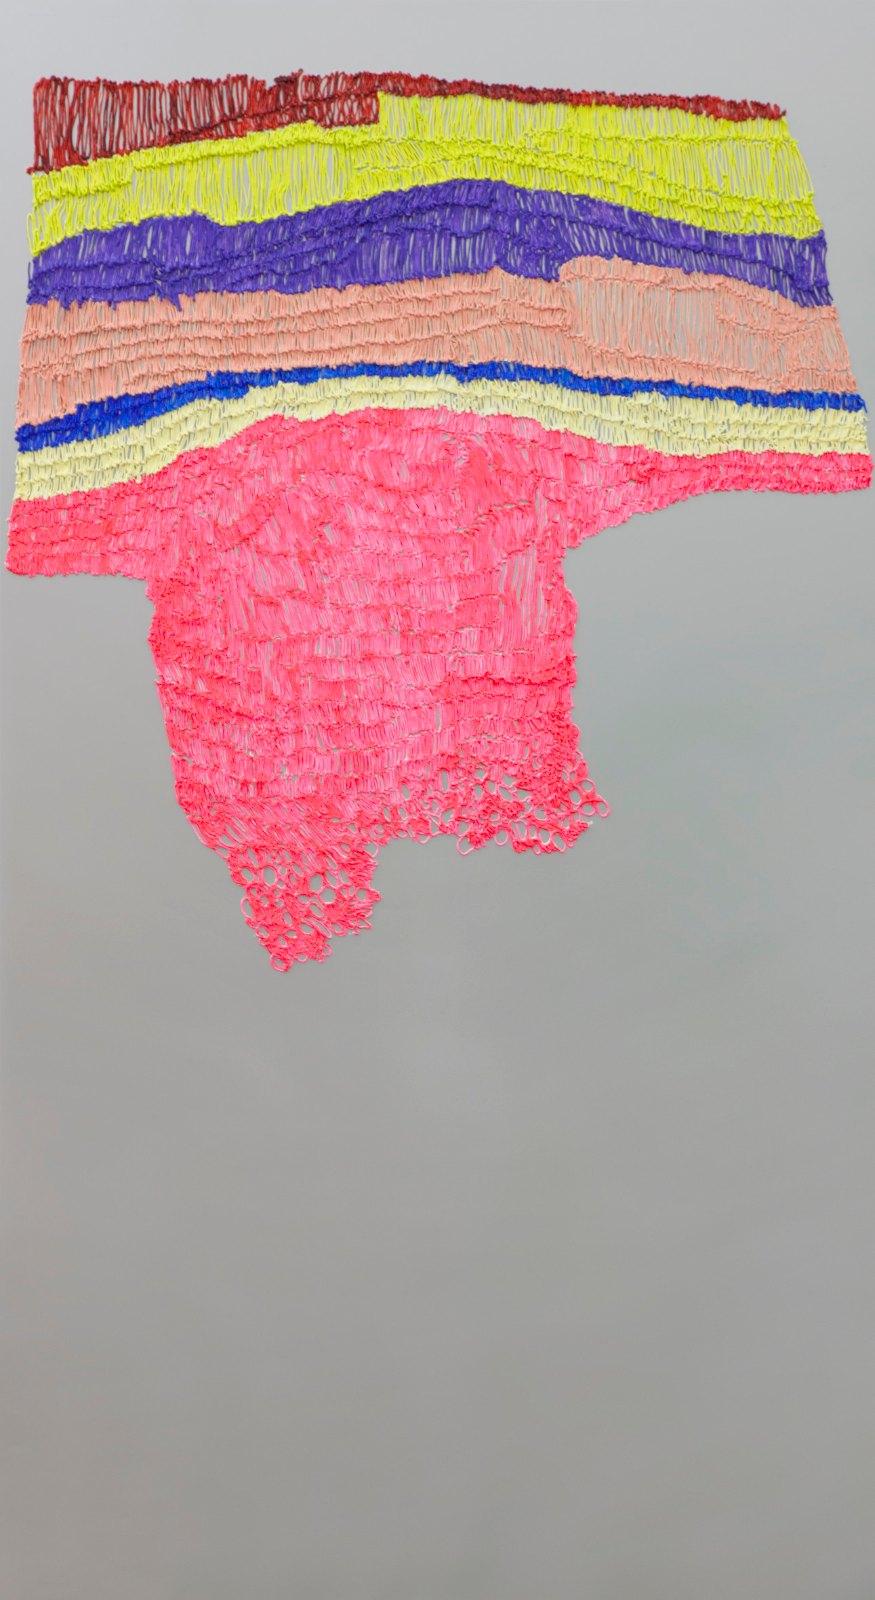 Handmade # 7, 2011-2012, acrylic on alucore, 220 x 120 cm